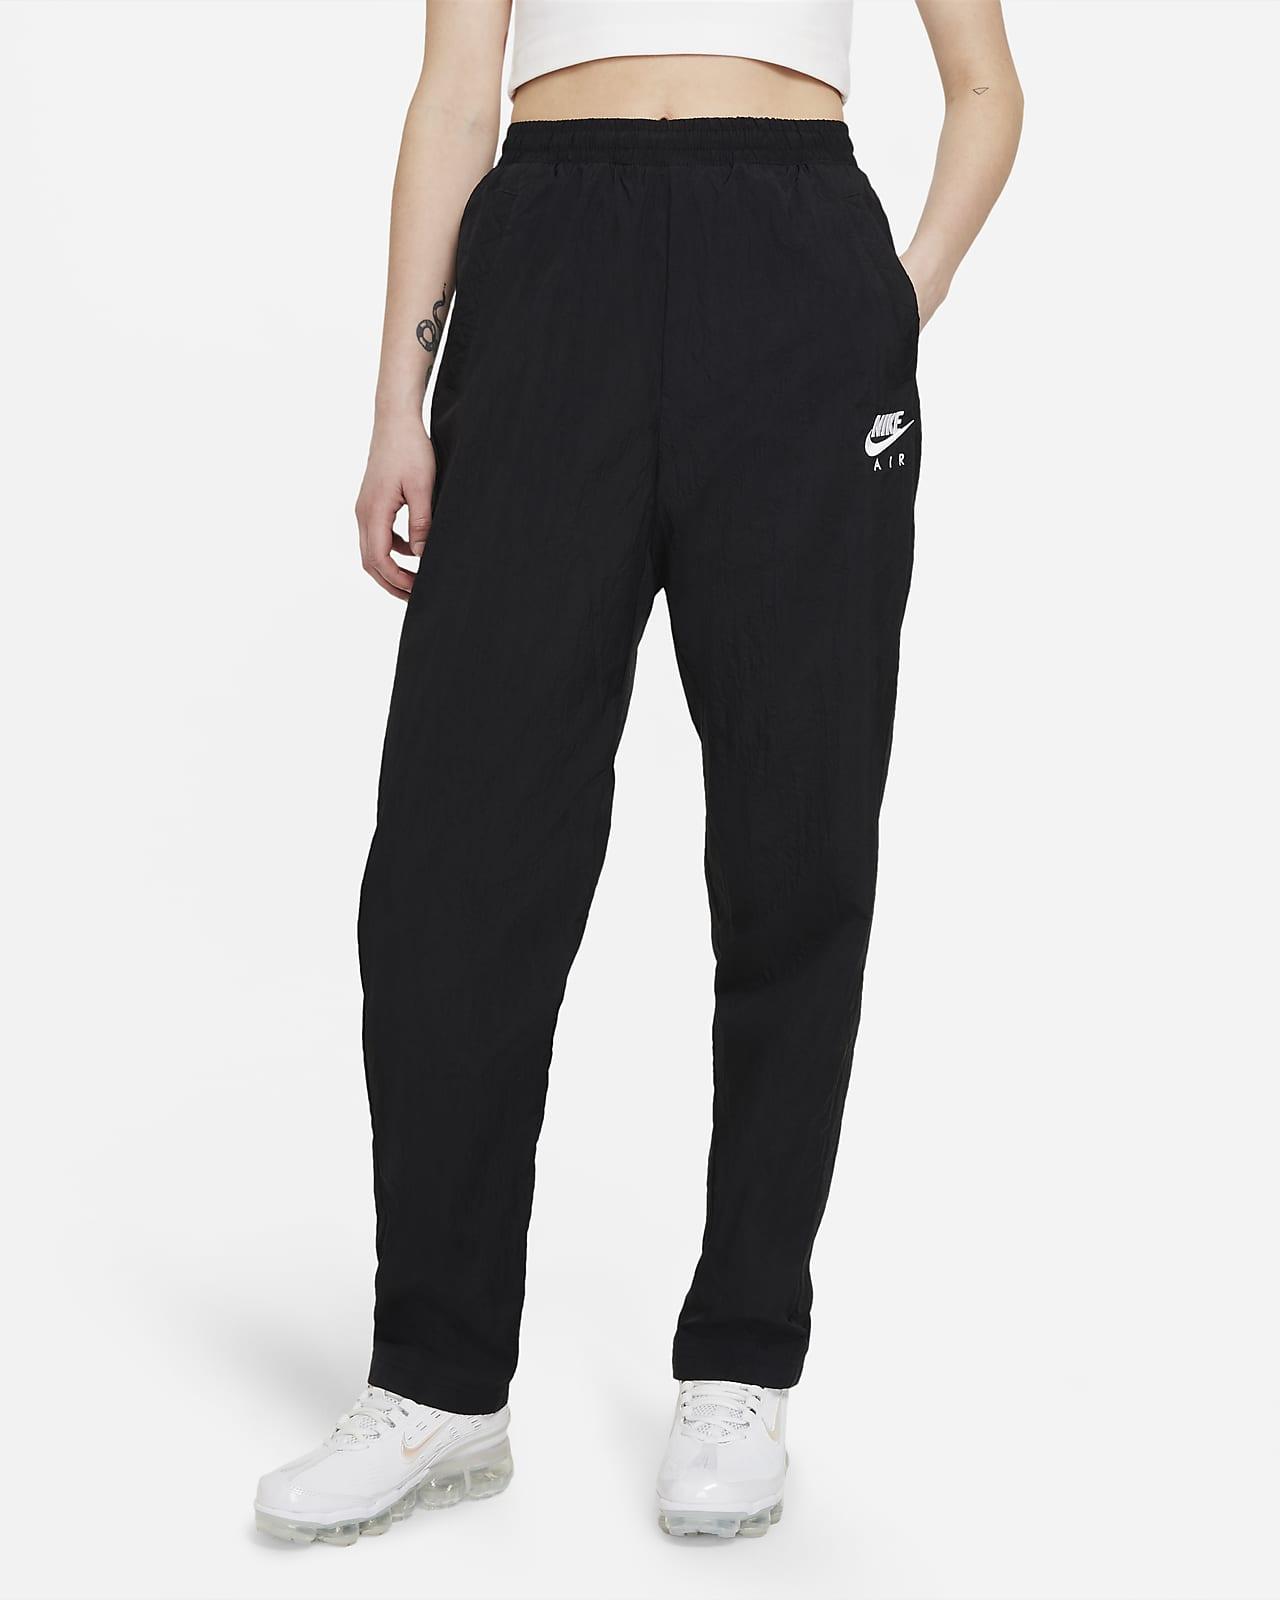 Nike Air Women's Woven Trousers